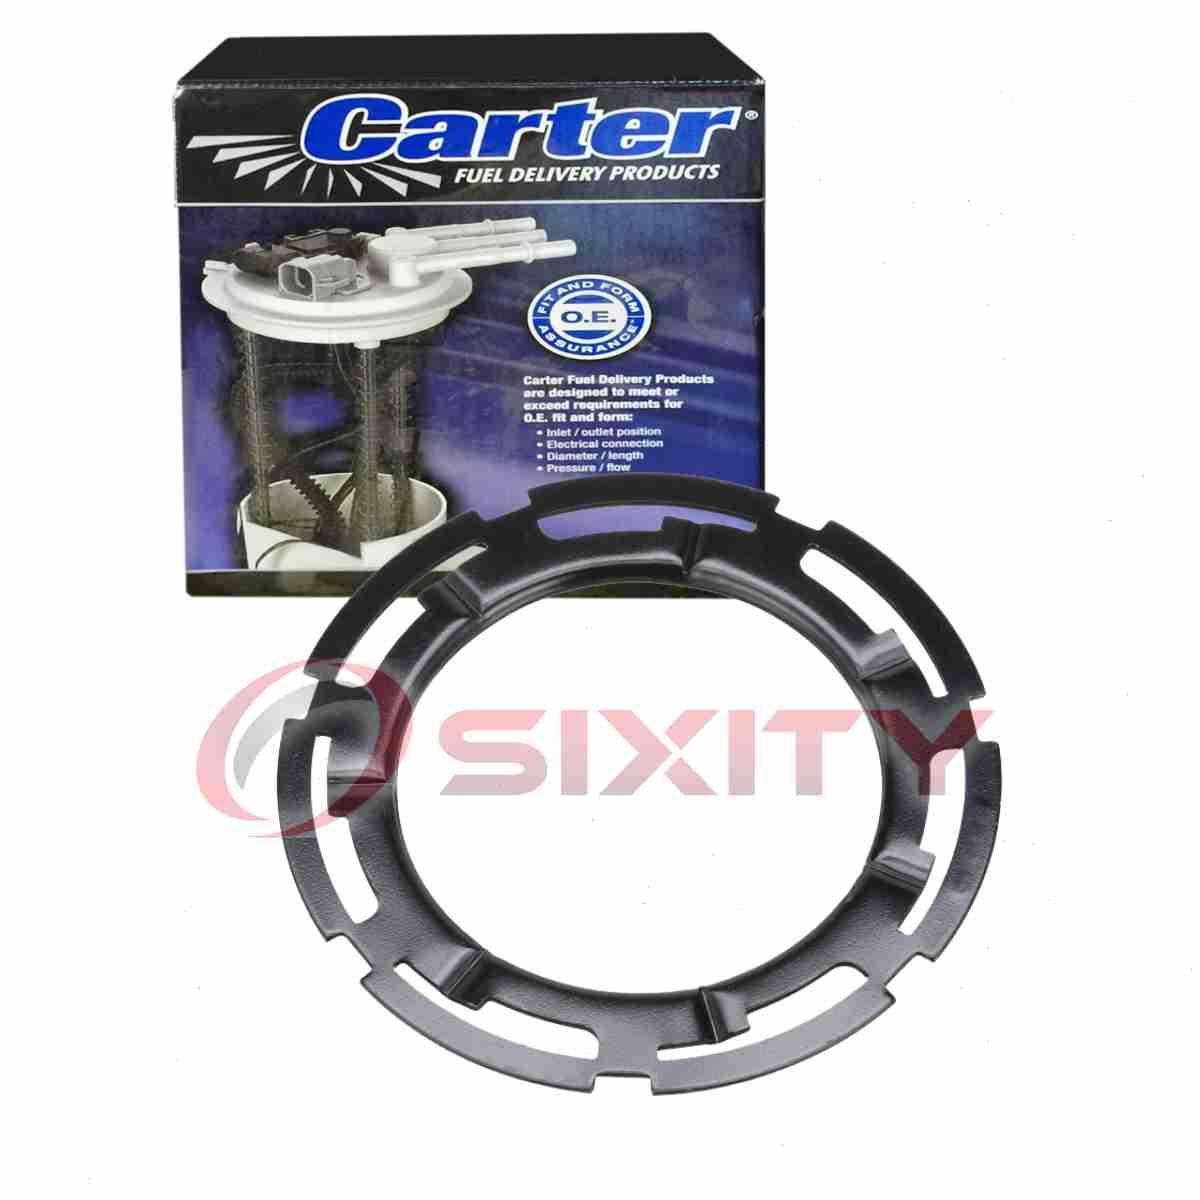 Carter Fuel Tank Lock Ring for 2004-2009 Hummer H2 6.2L 6.0L V8 Pump Gas yi